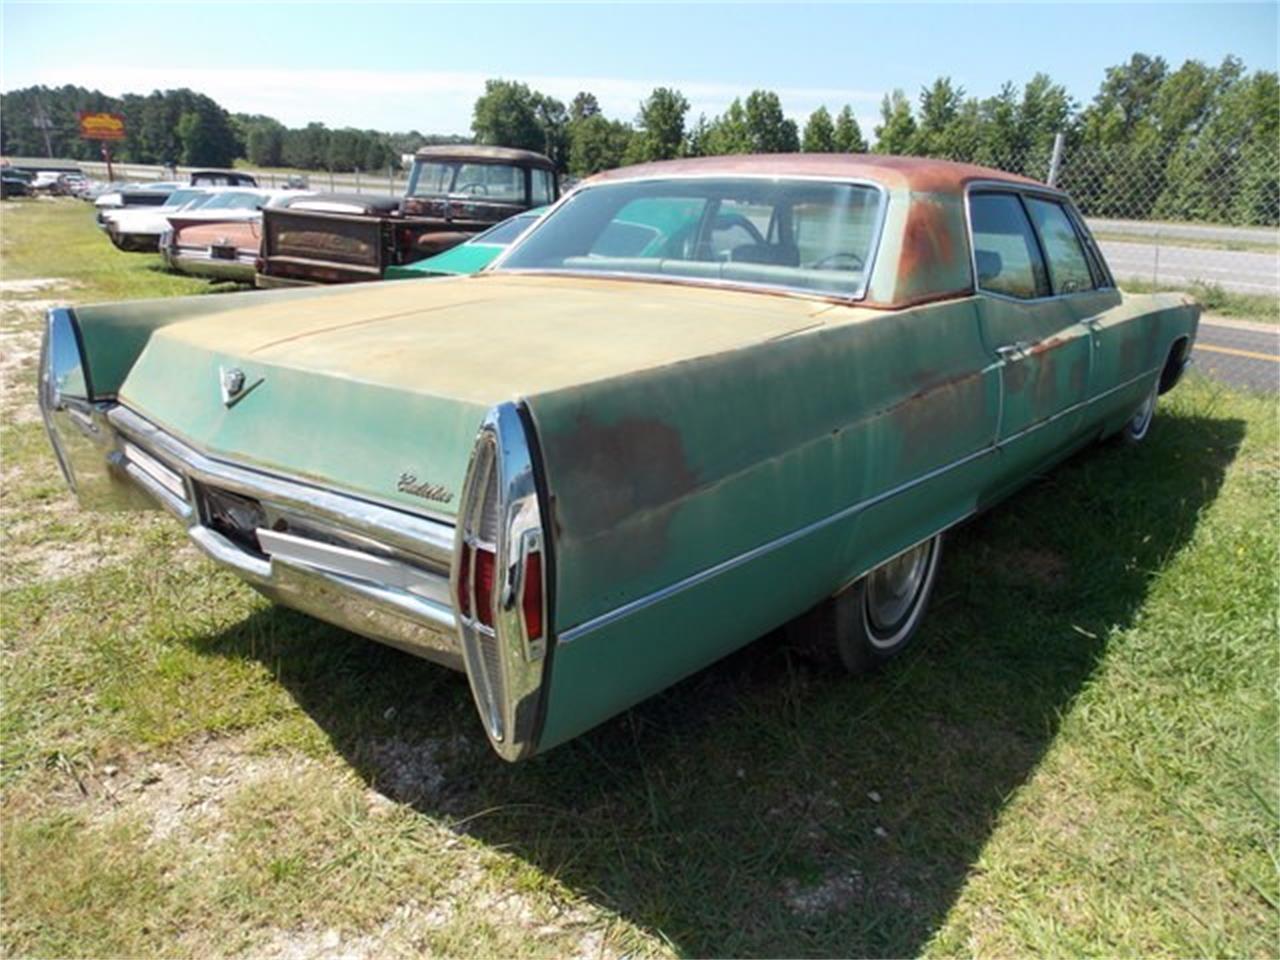 1968 Cadillac Sedan for Sale | ClassicCars.com | CC-873986